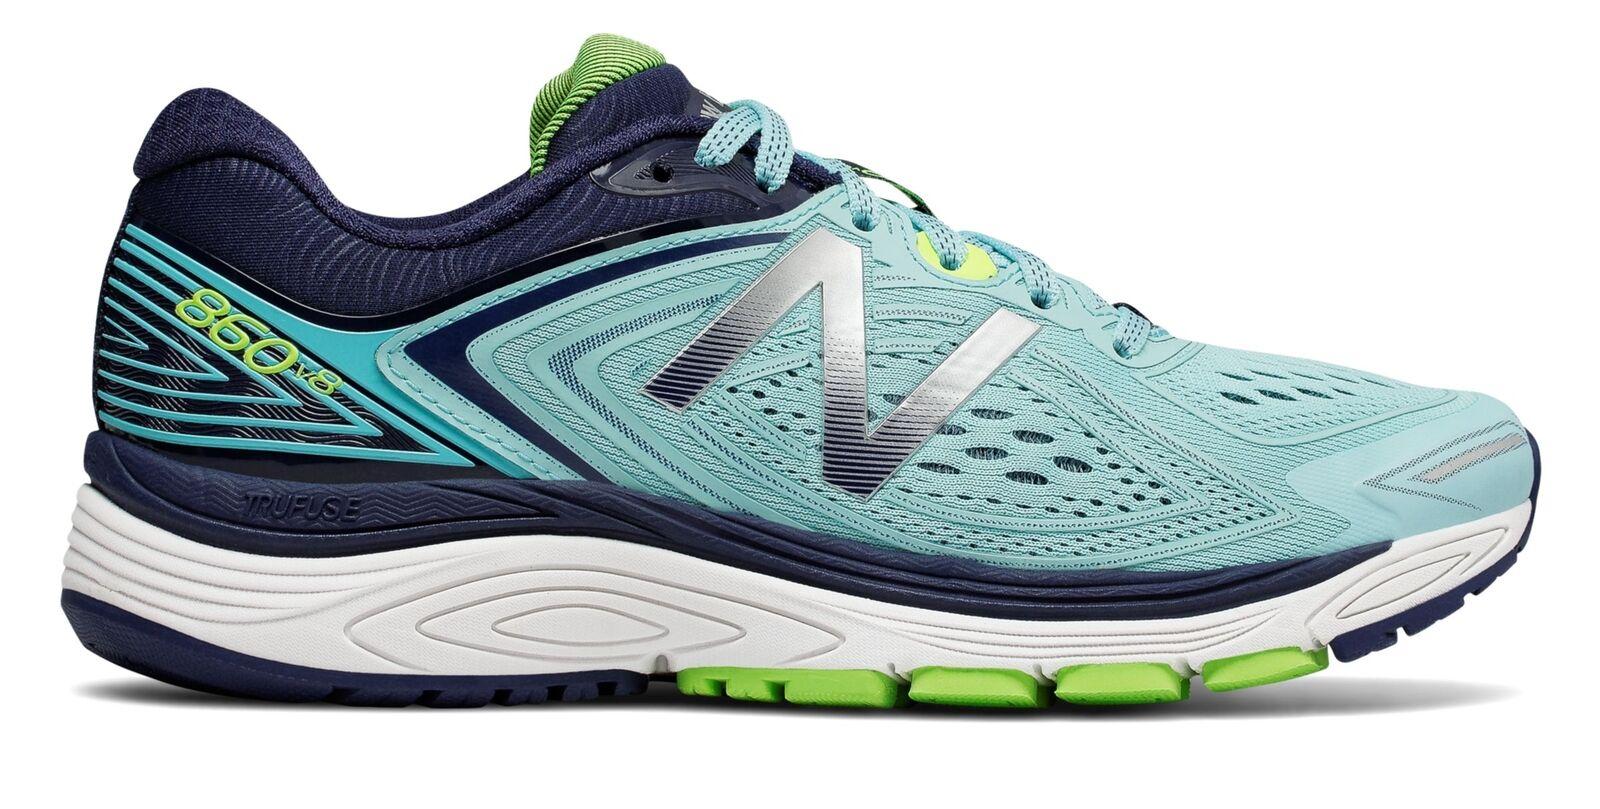 New Balance Female Wouomo 860V8 Running scarpe scarpe da ginnastica blu With Navy & verde